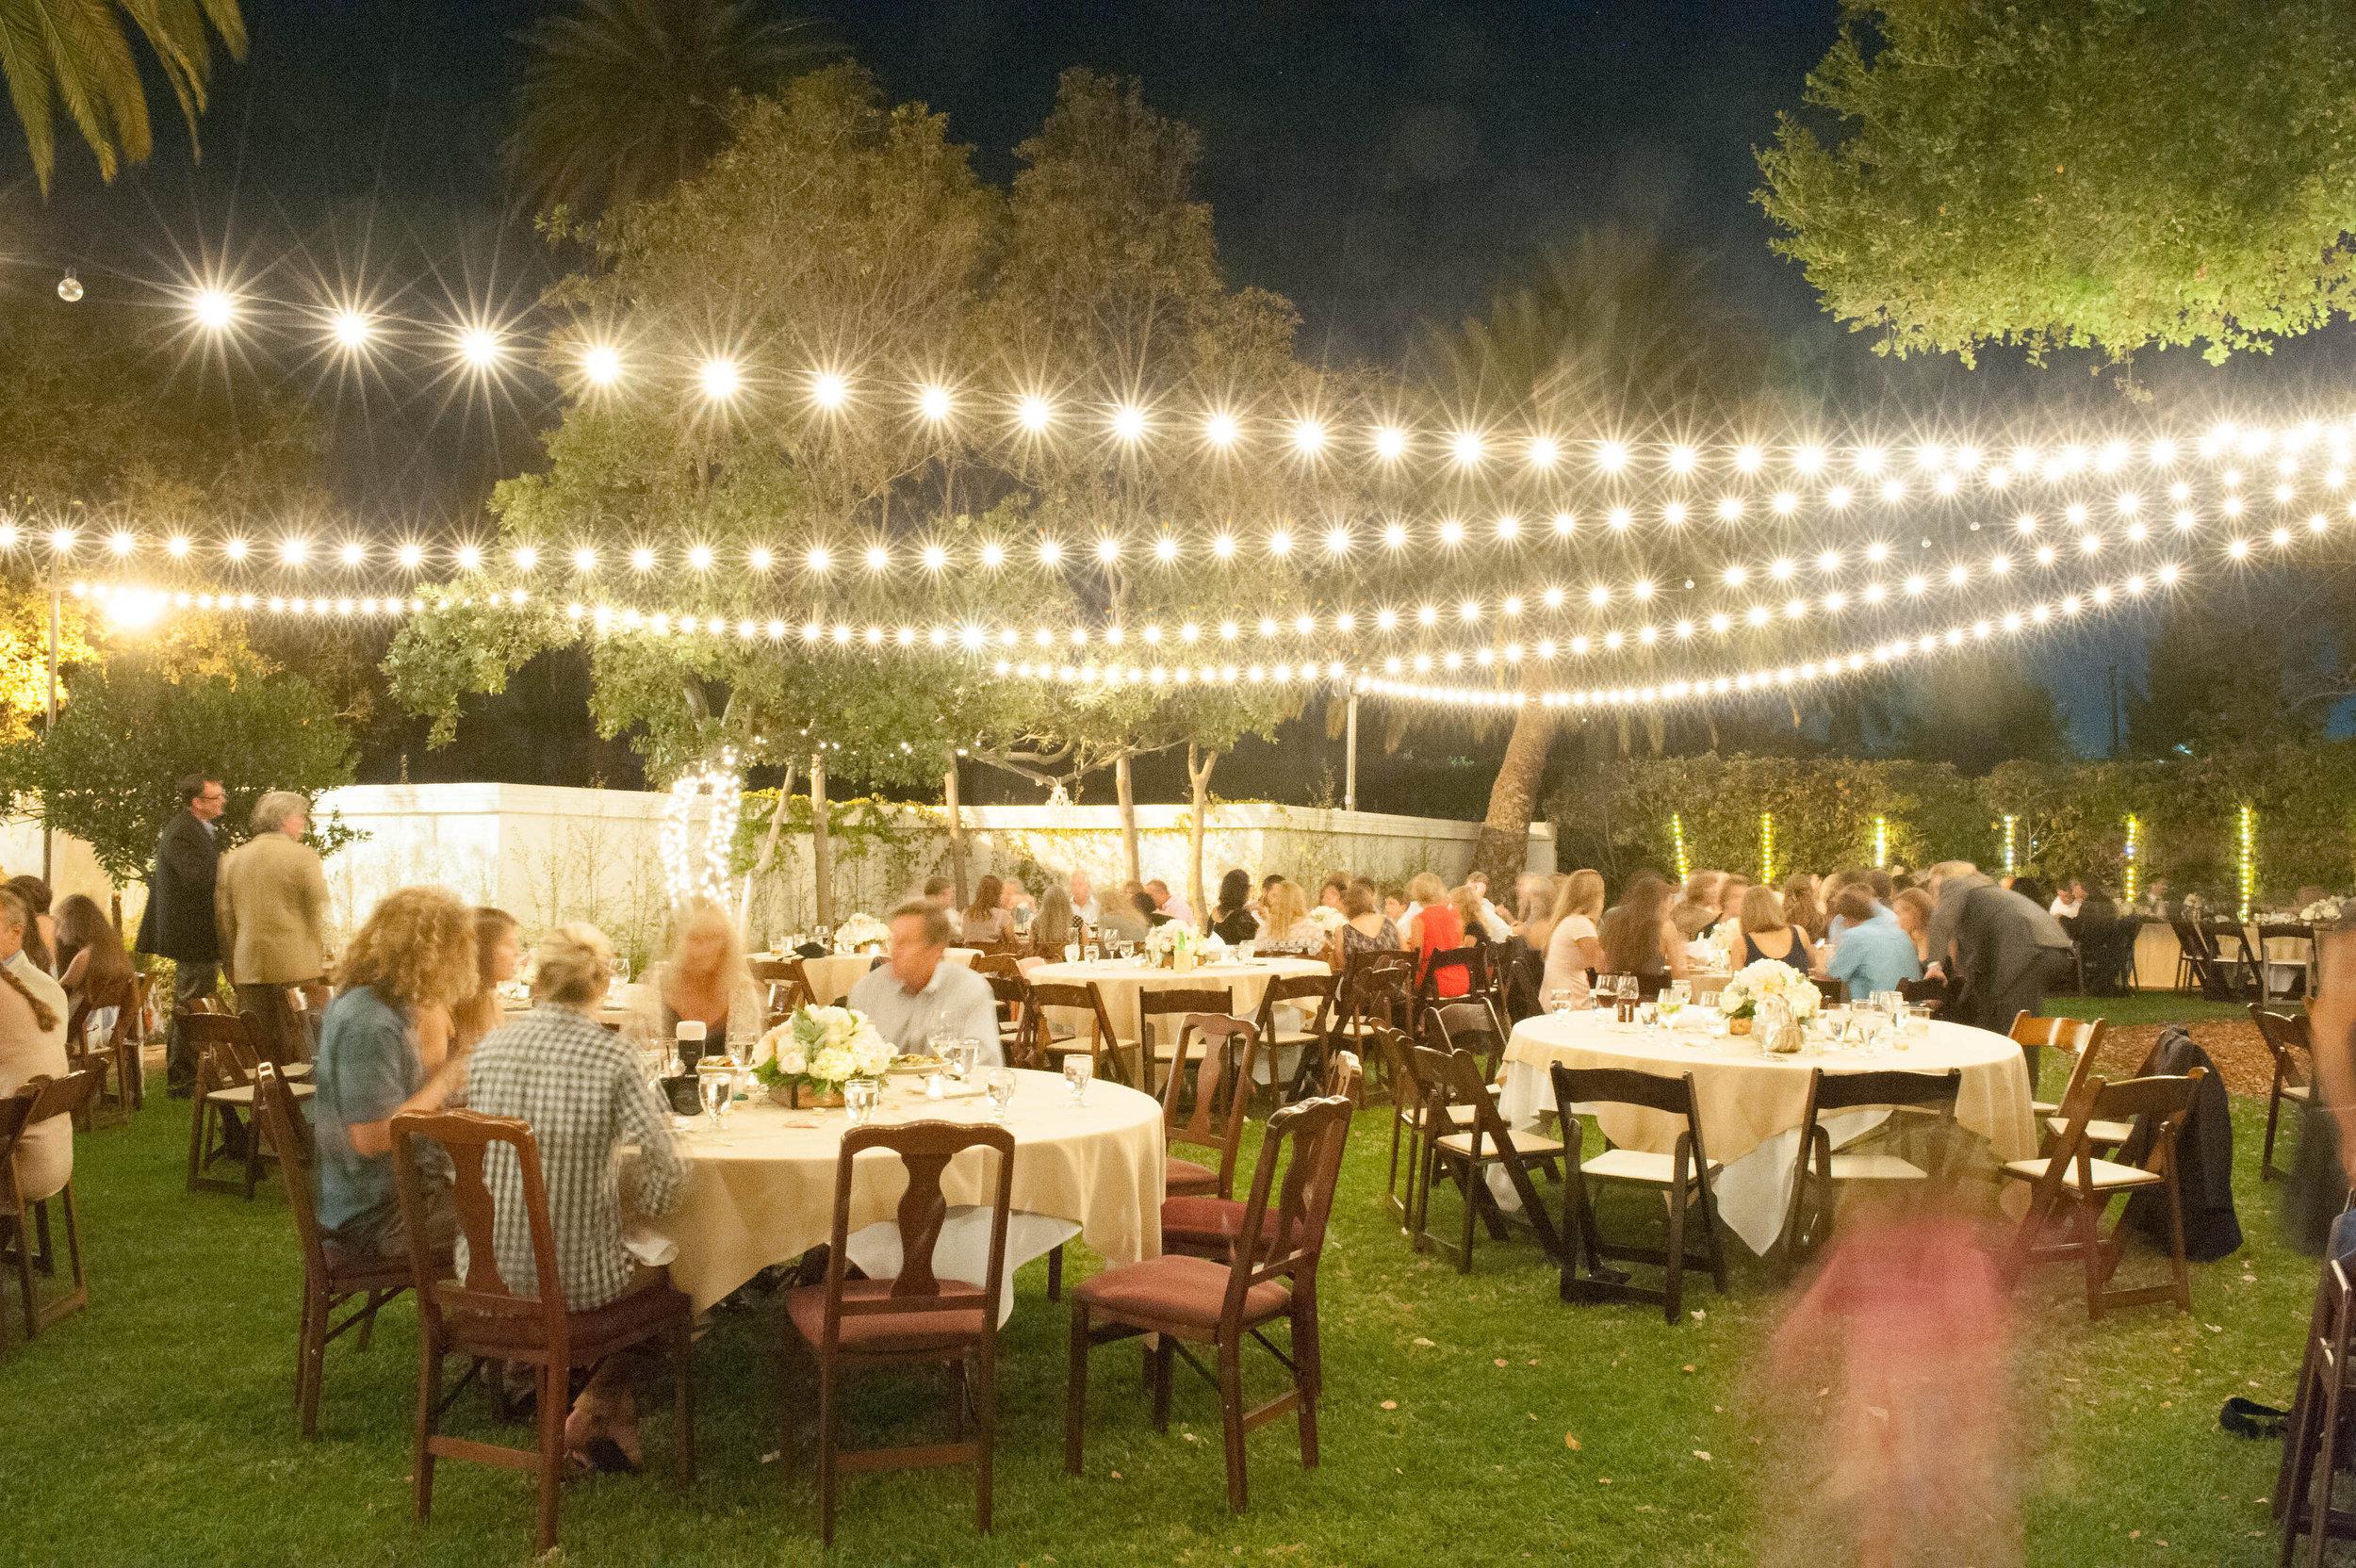 www.santabarbarawedding.com | ByCherry Photography | The Santa Barbara Club | Wedding Venue | Private Estate | String Lights | Garden Wedding